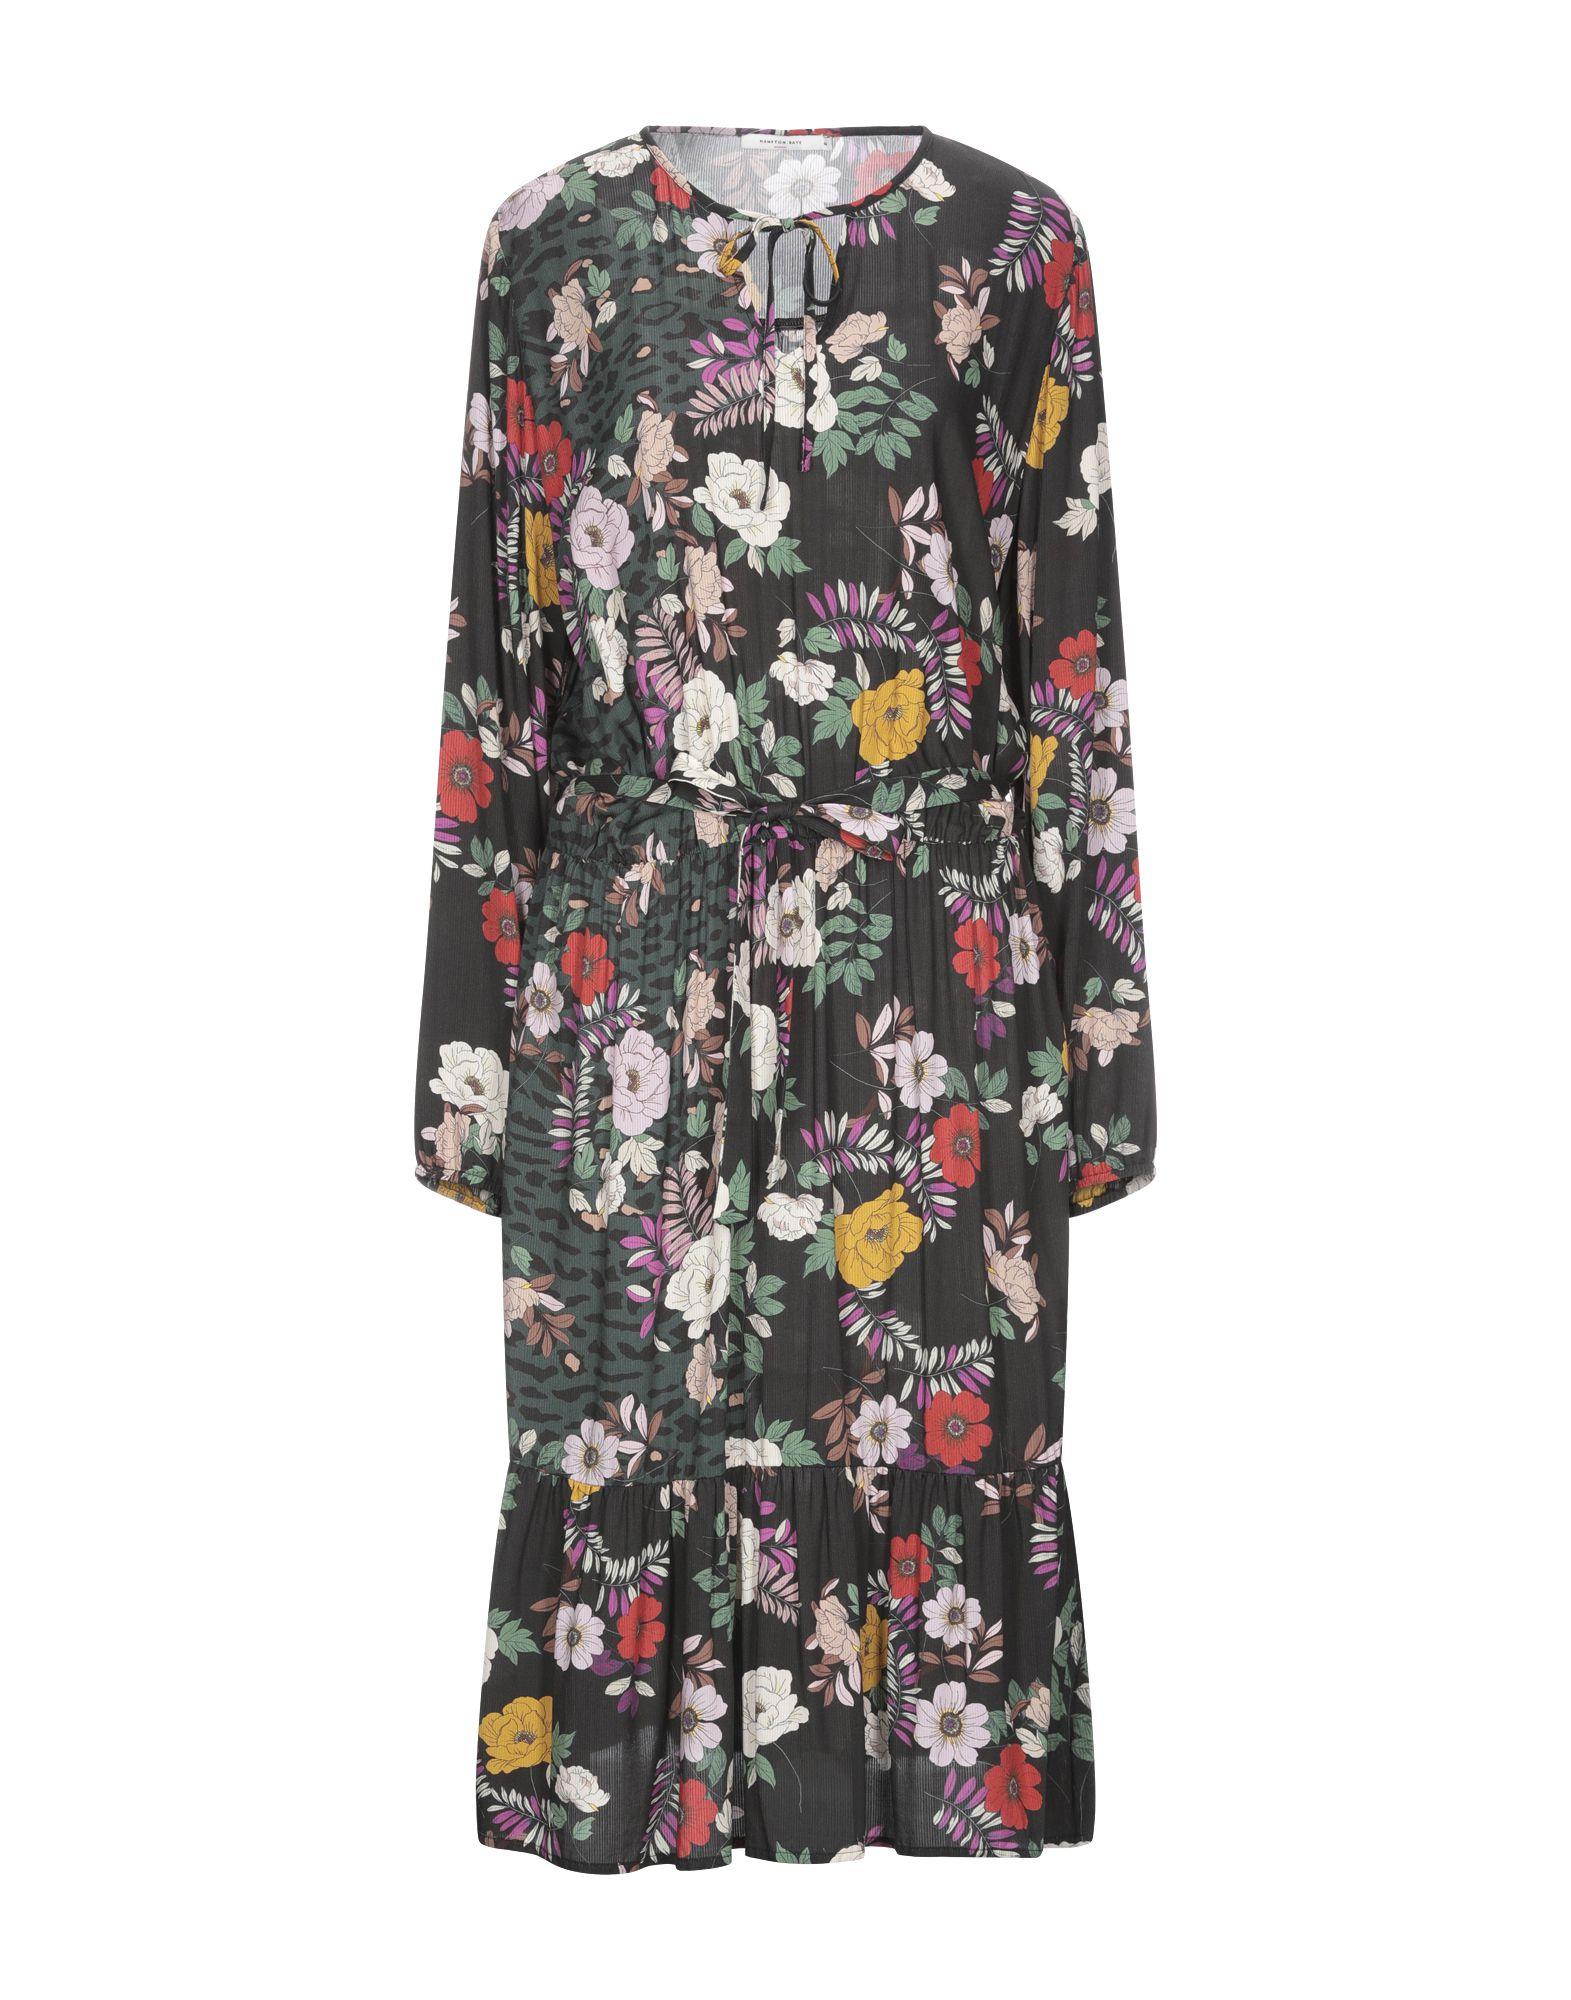 HAMPTON BAYS Платье миди